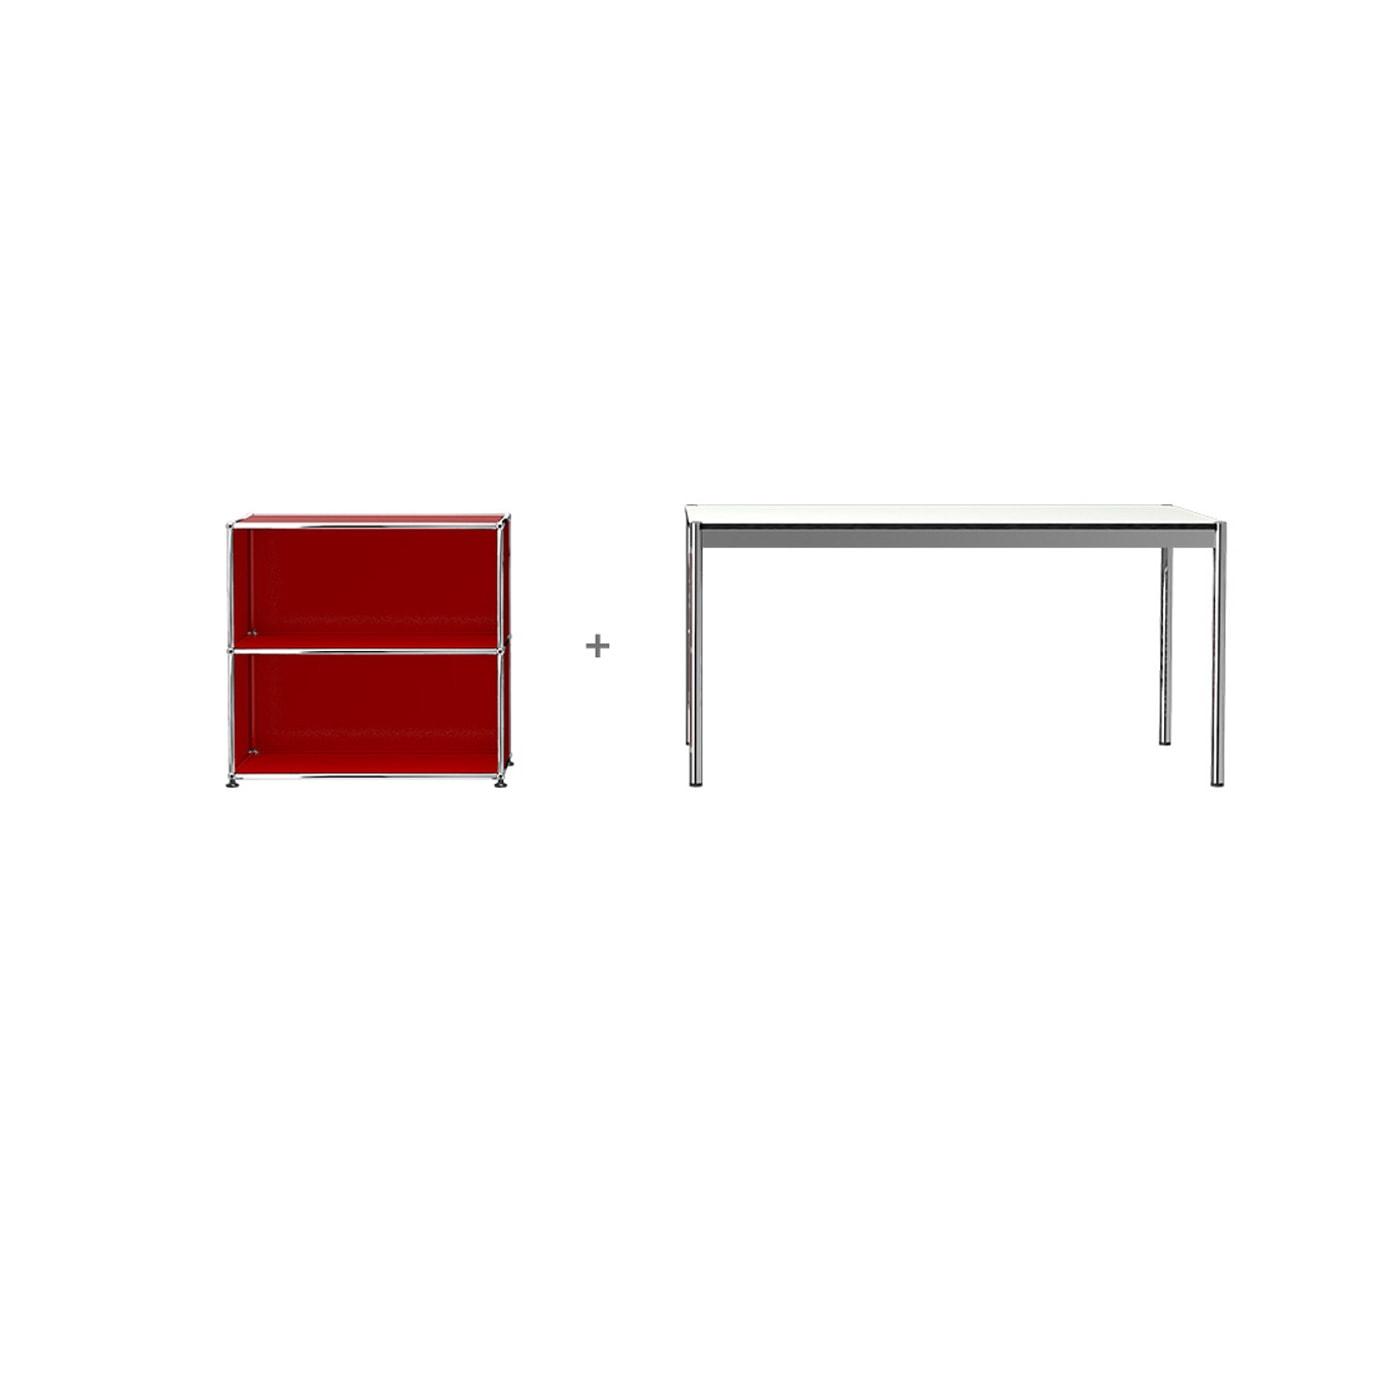 USM HomeOffice 02 Haller tavolo contenitore